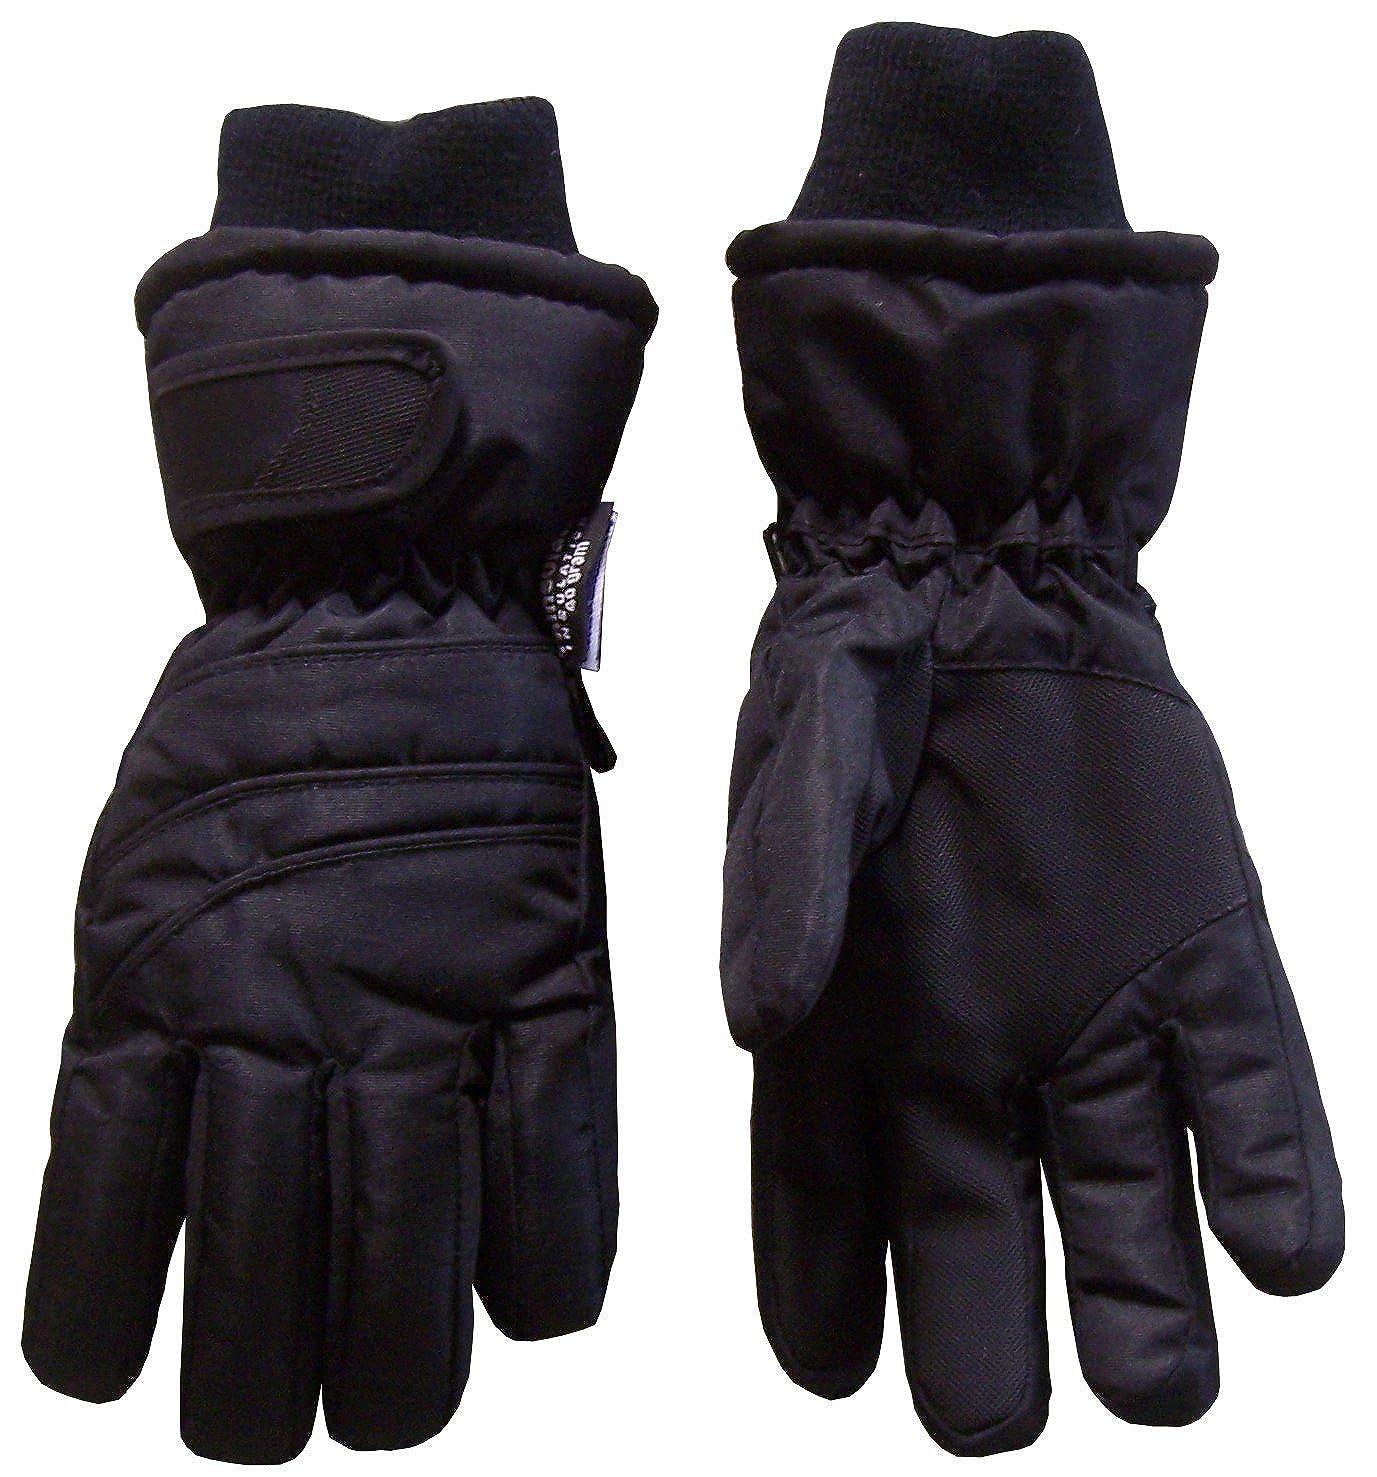 N'Ice Caps Kids Bulky Thinsulate and Waterproof Ski Glove With Ridges (8-10yrs, Black) 5121